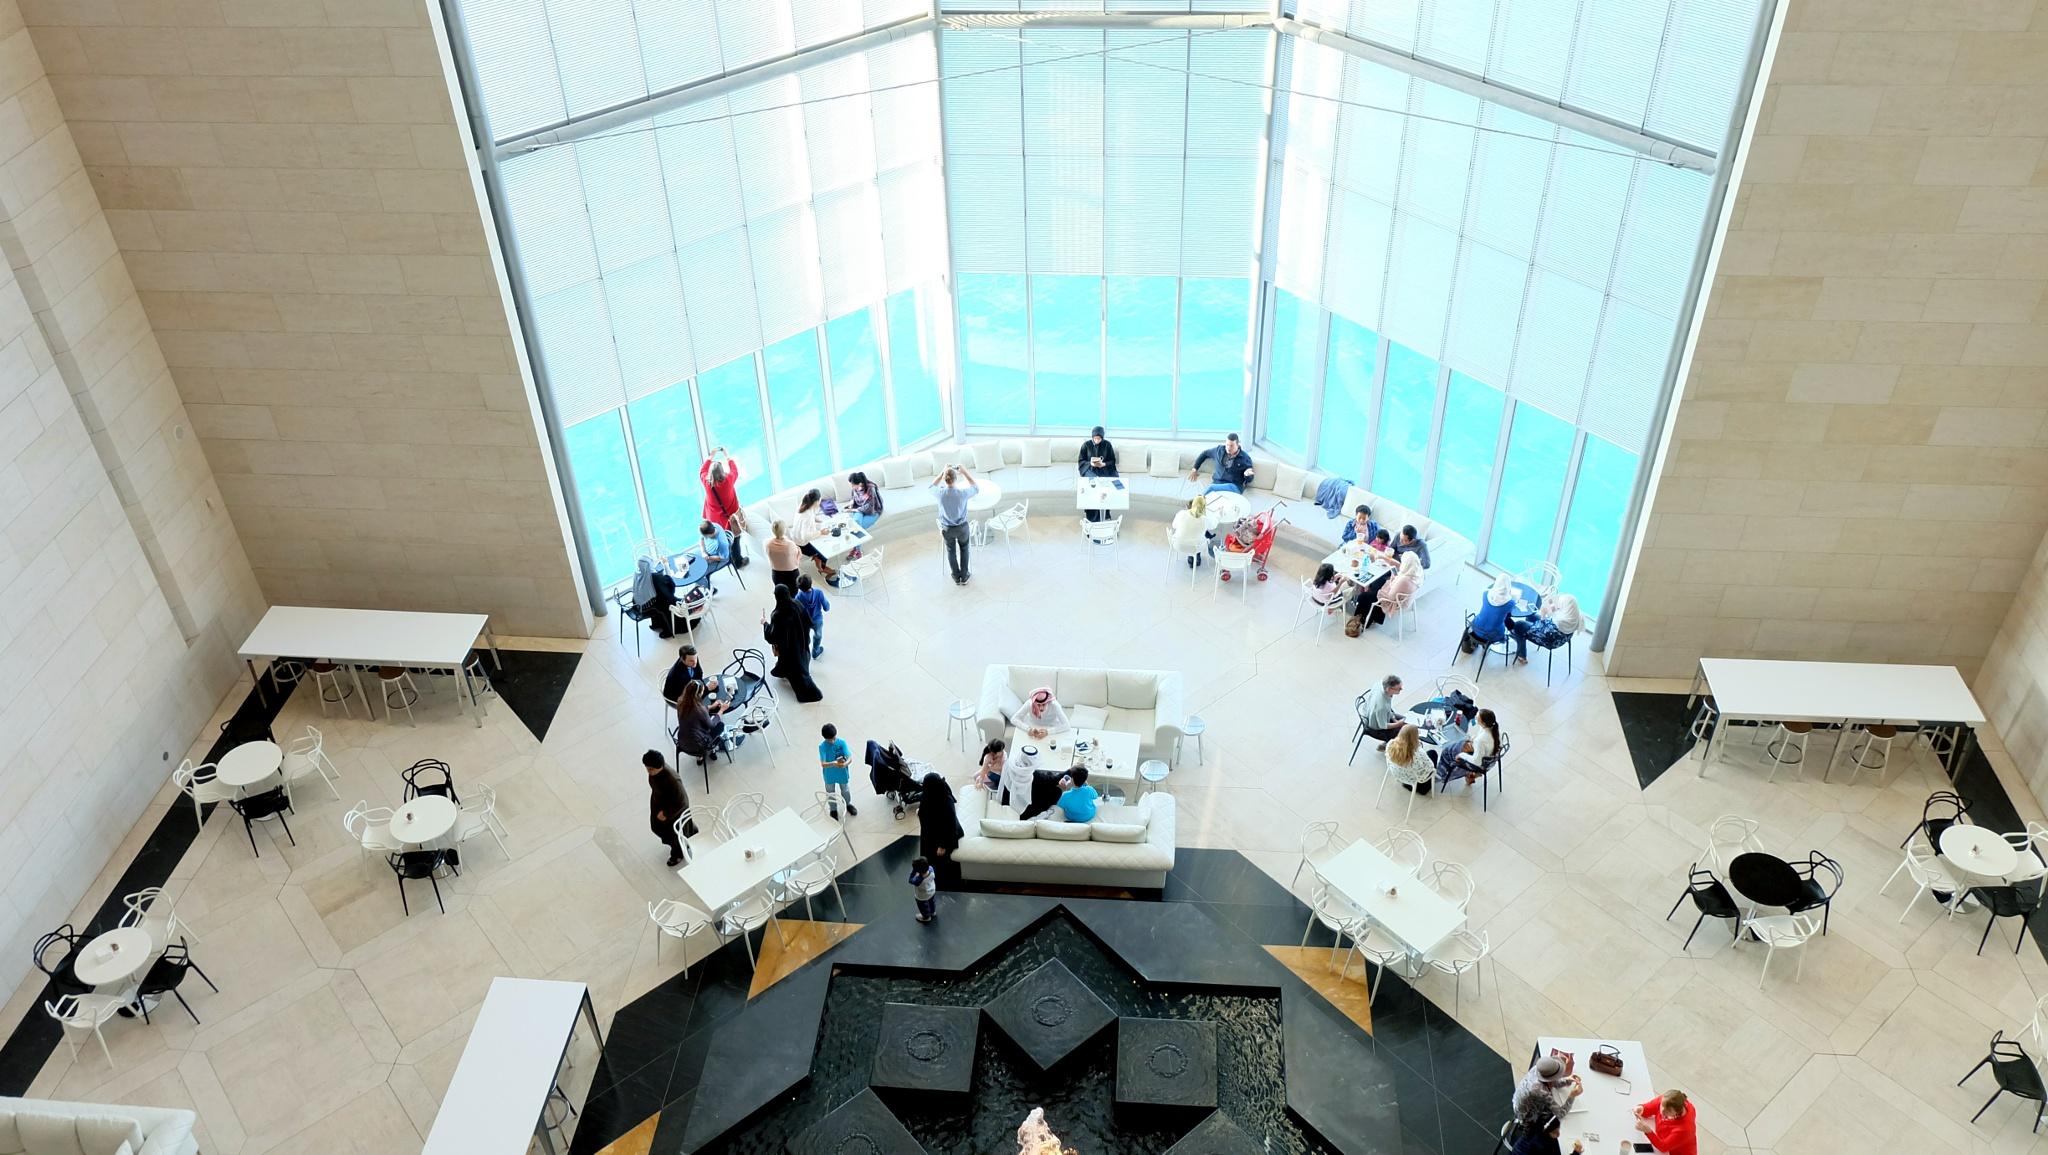 The Hall_1 by Sadiq Ali AlQatari